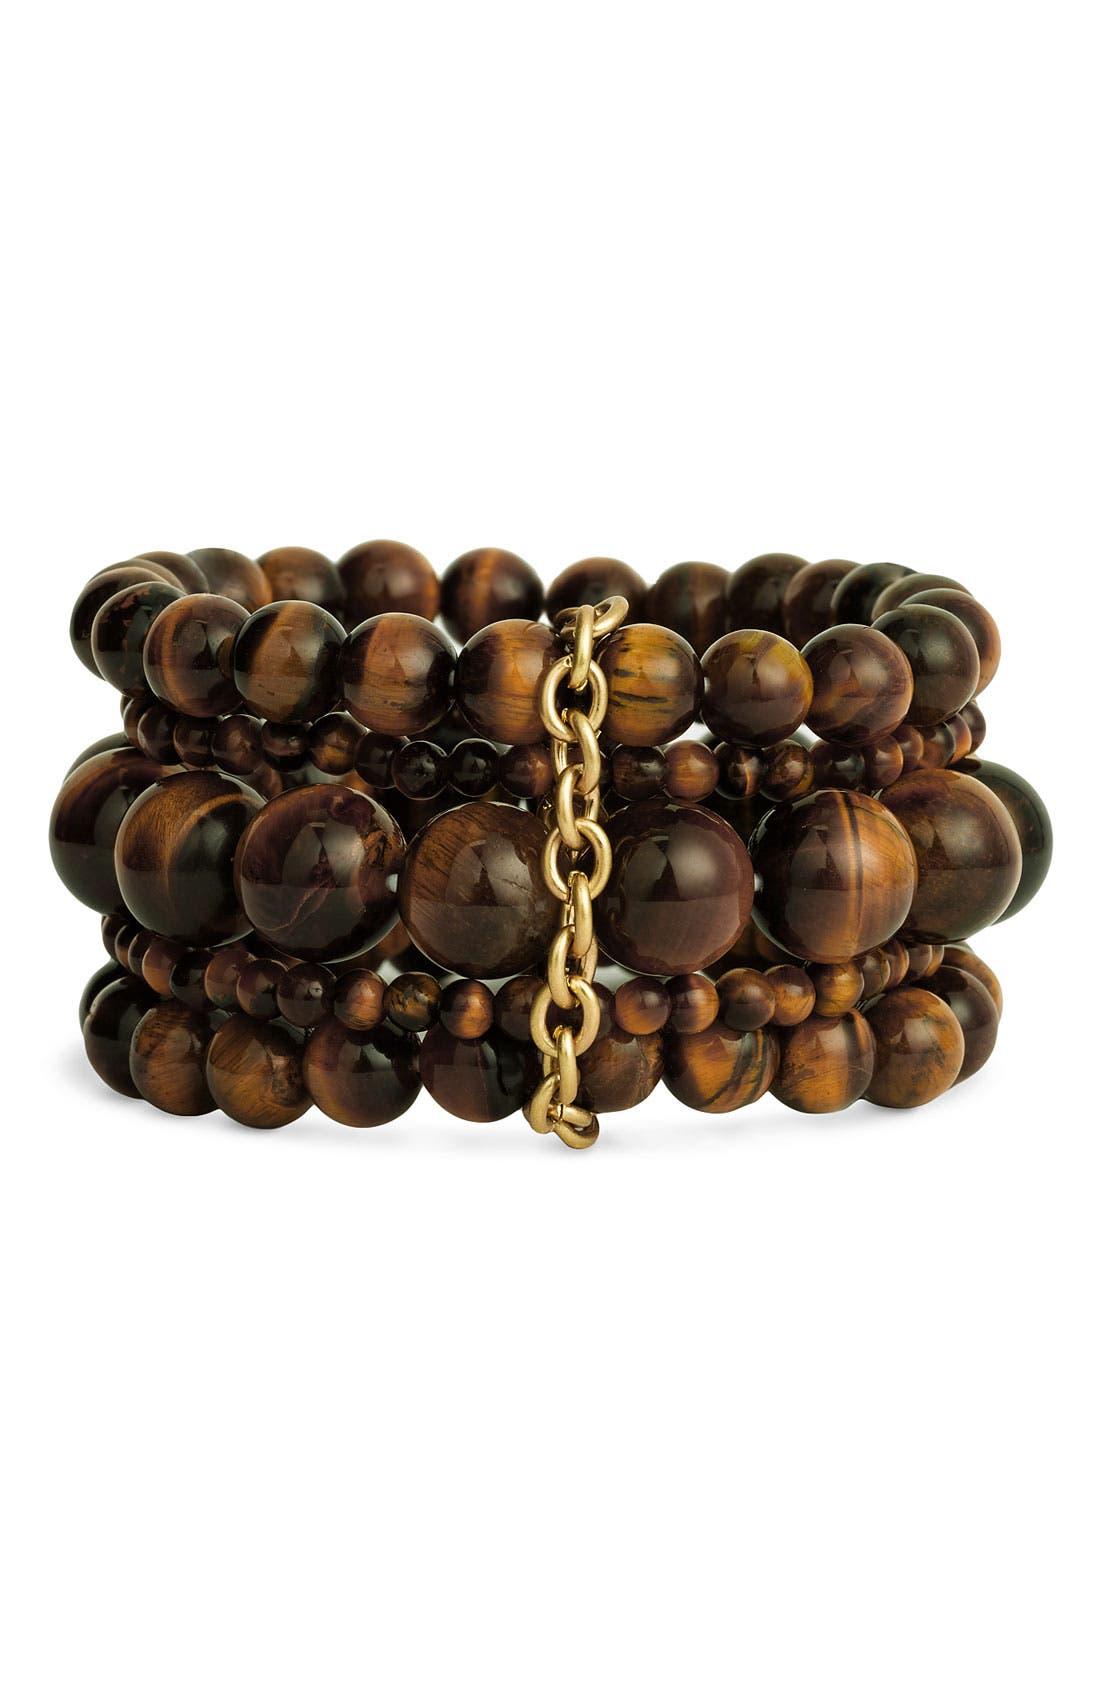 Main Image - Nordstrom Semiprecious Bead Stretch Bracelets (Set of 5)